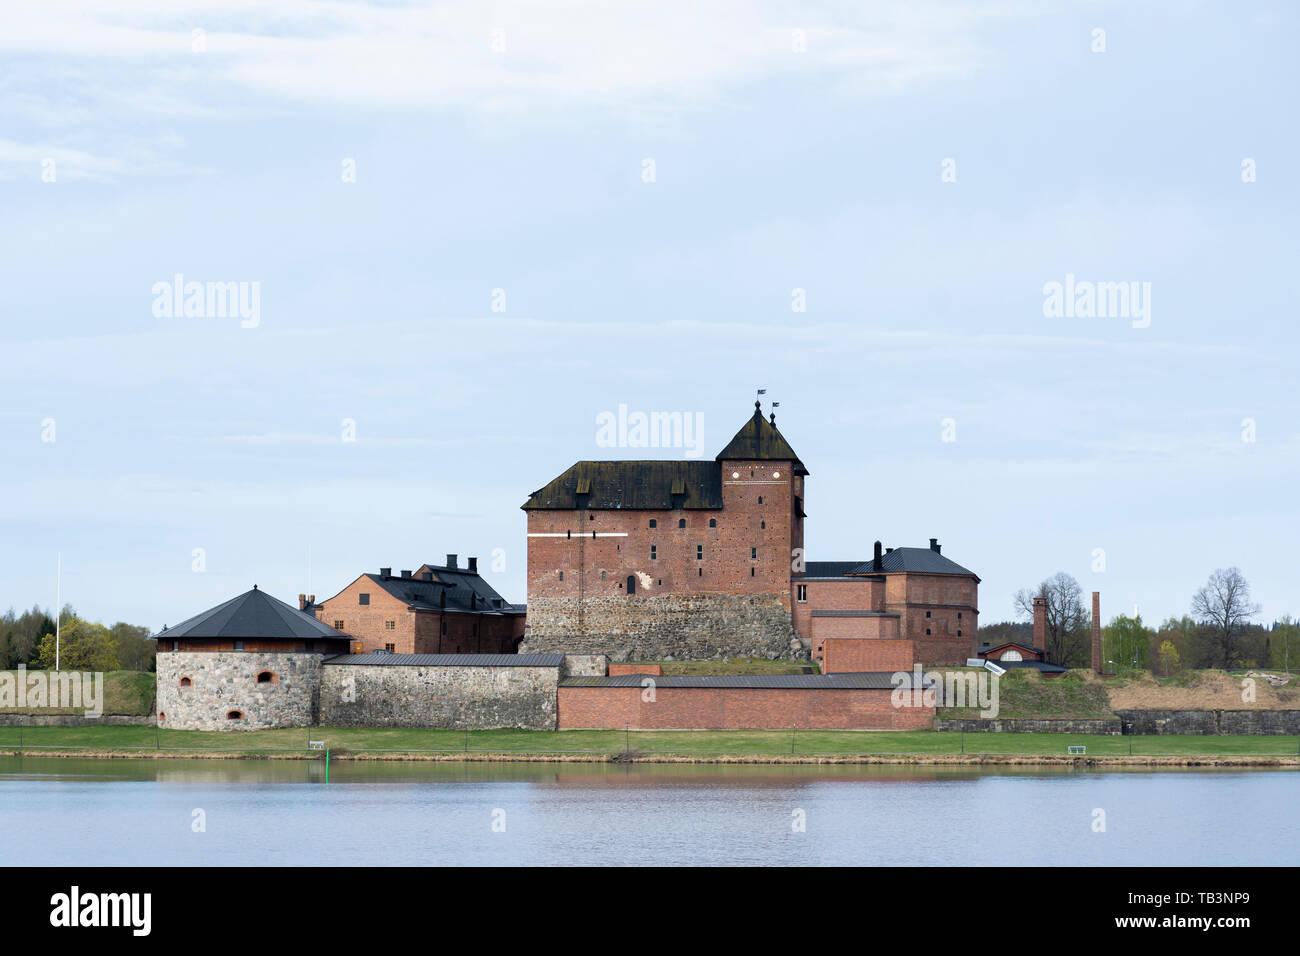 Hame castle by the Vanajavesi lake in Hämeenlinna Finland Stock Photo